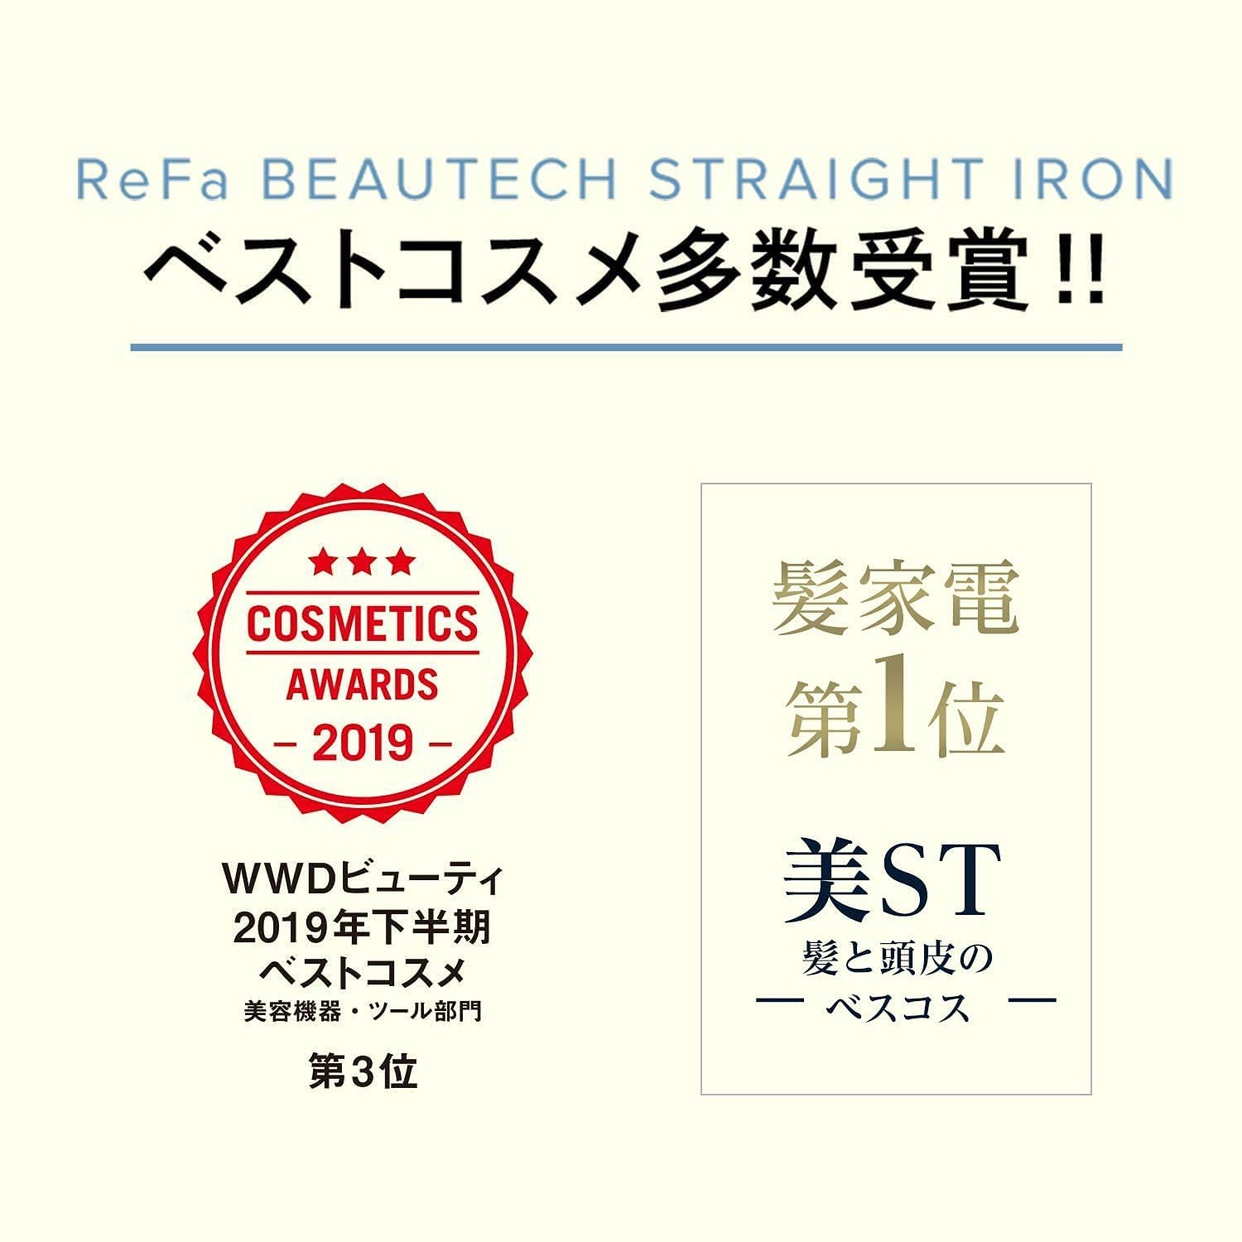 ReFa(リファ) ビューテック ストレート アイロンの商品画像4